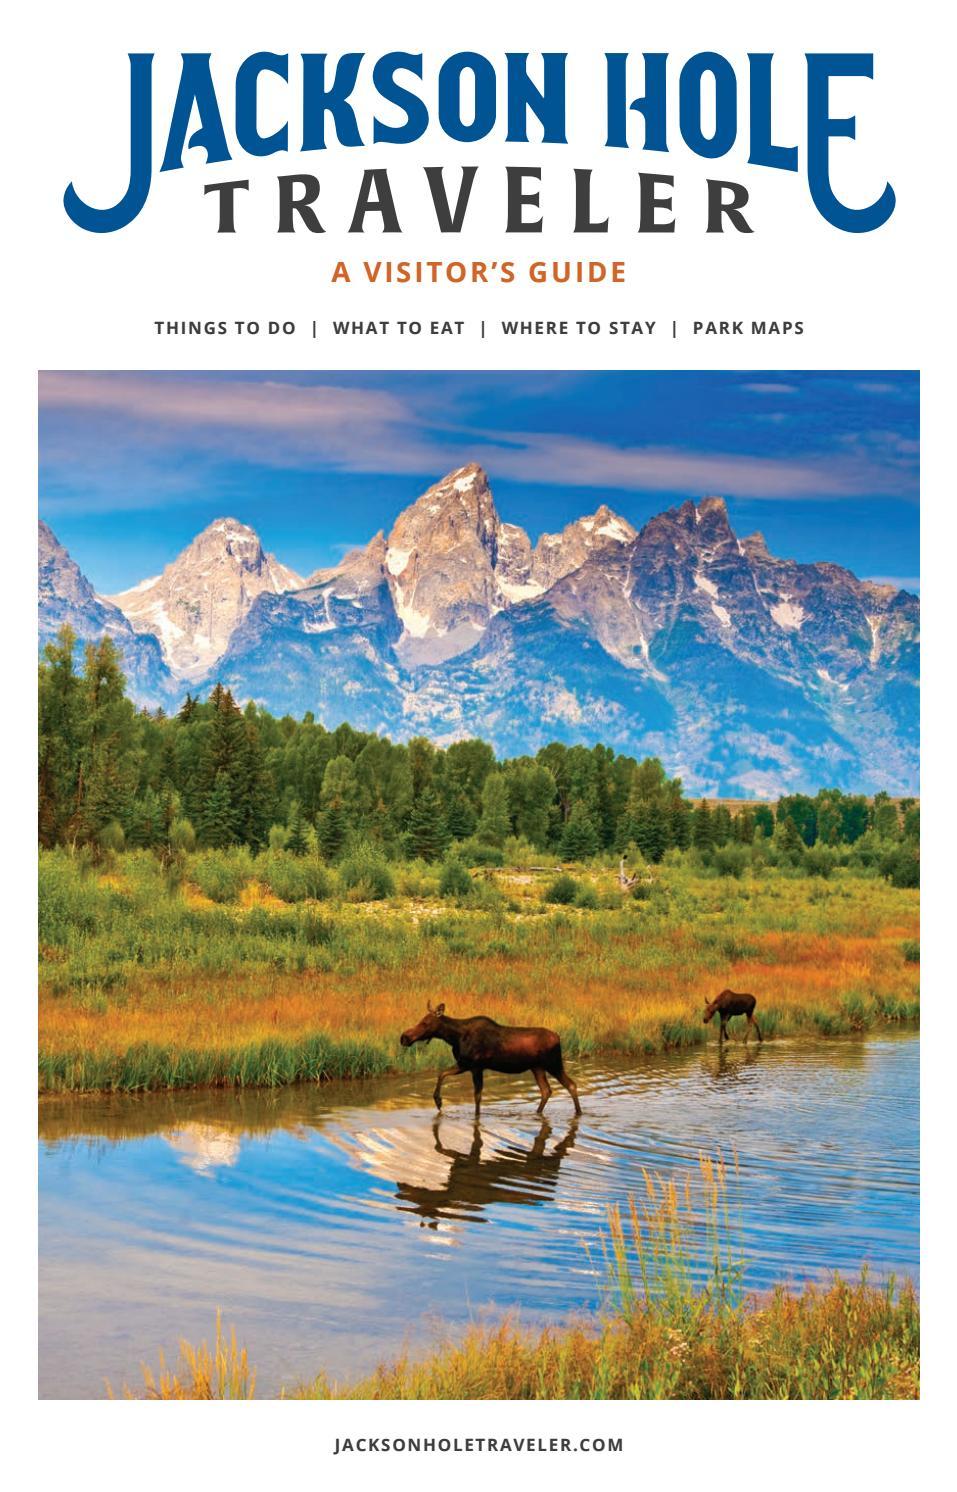 Bridger Teton National Forest Map Buffalo /& Jackson RD Waterproof